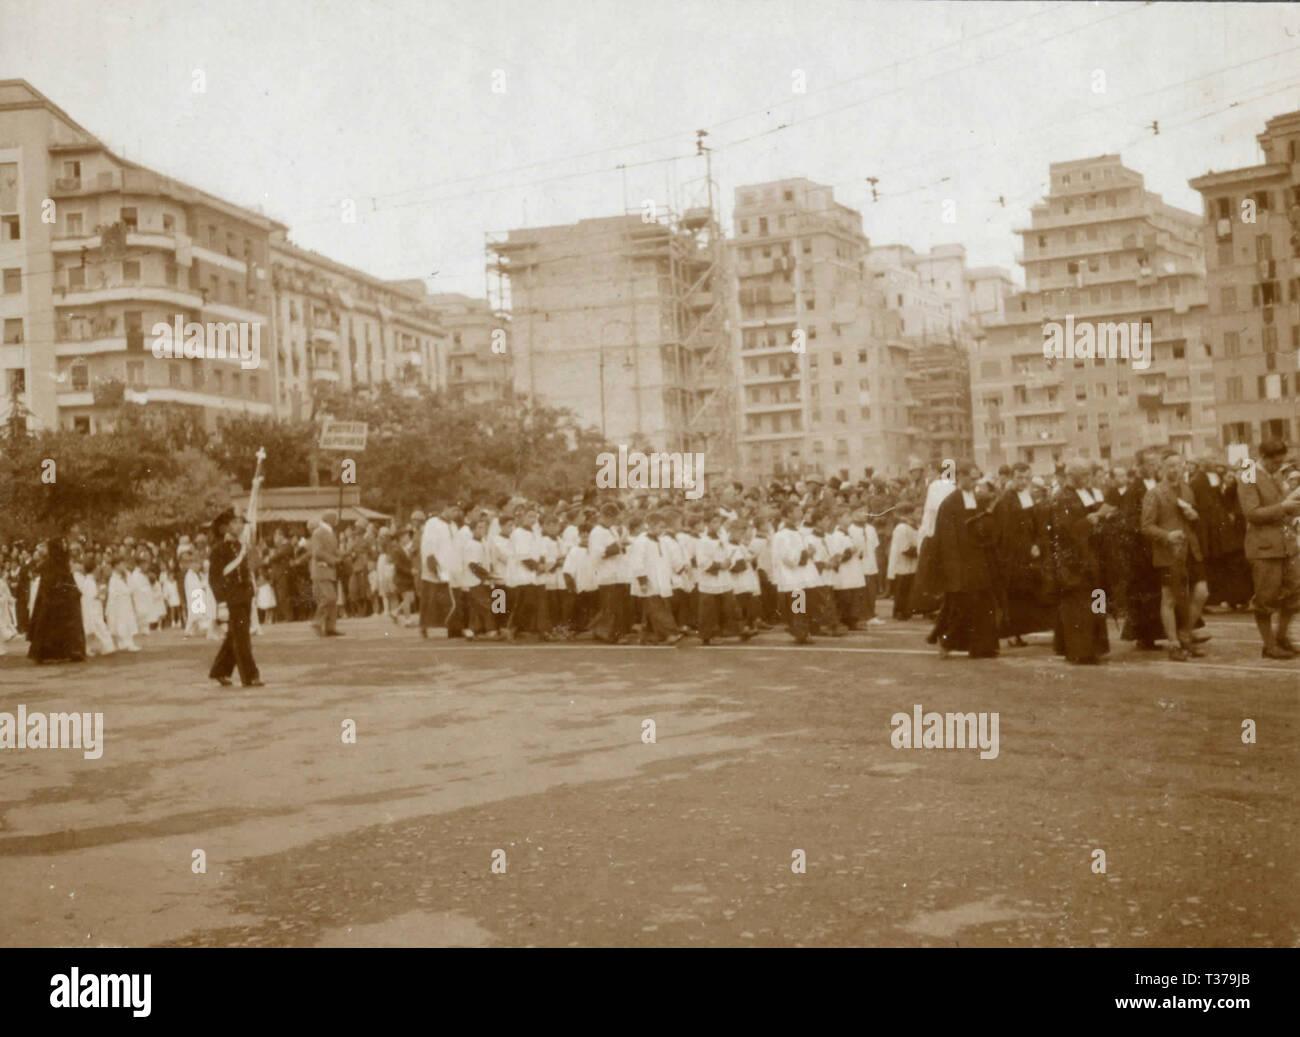 Corpus Domini procession, Rome, Italy 1920s - Stock Image